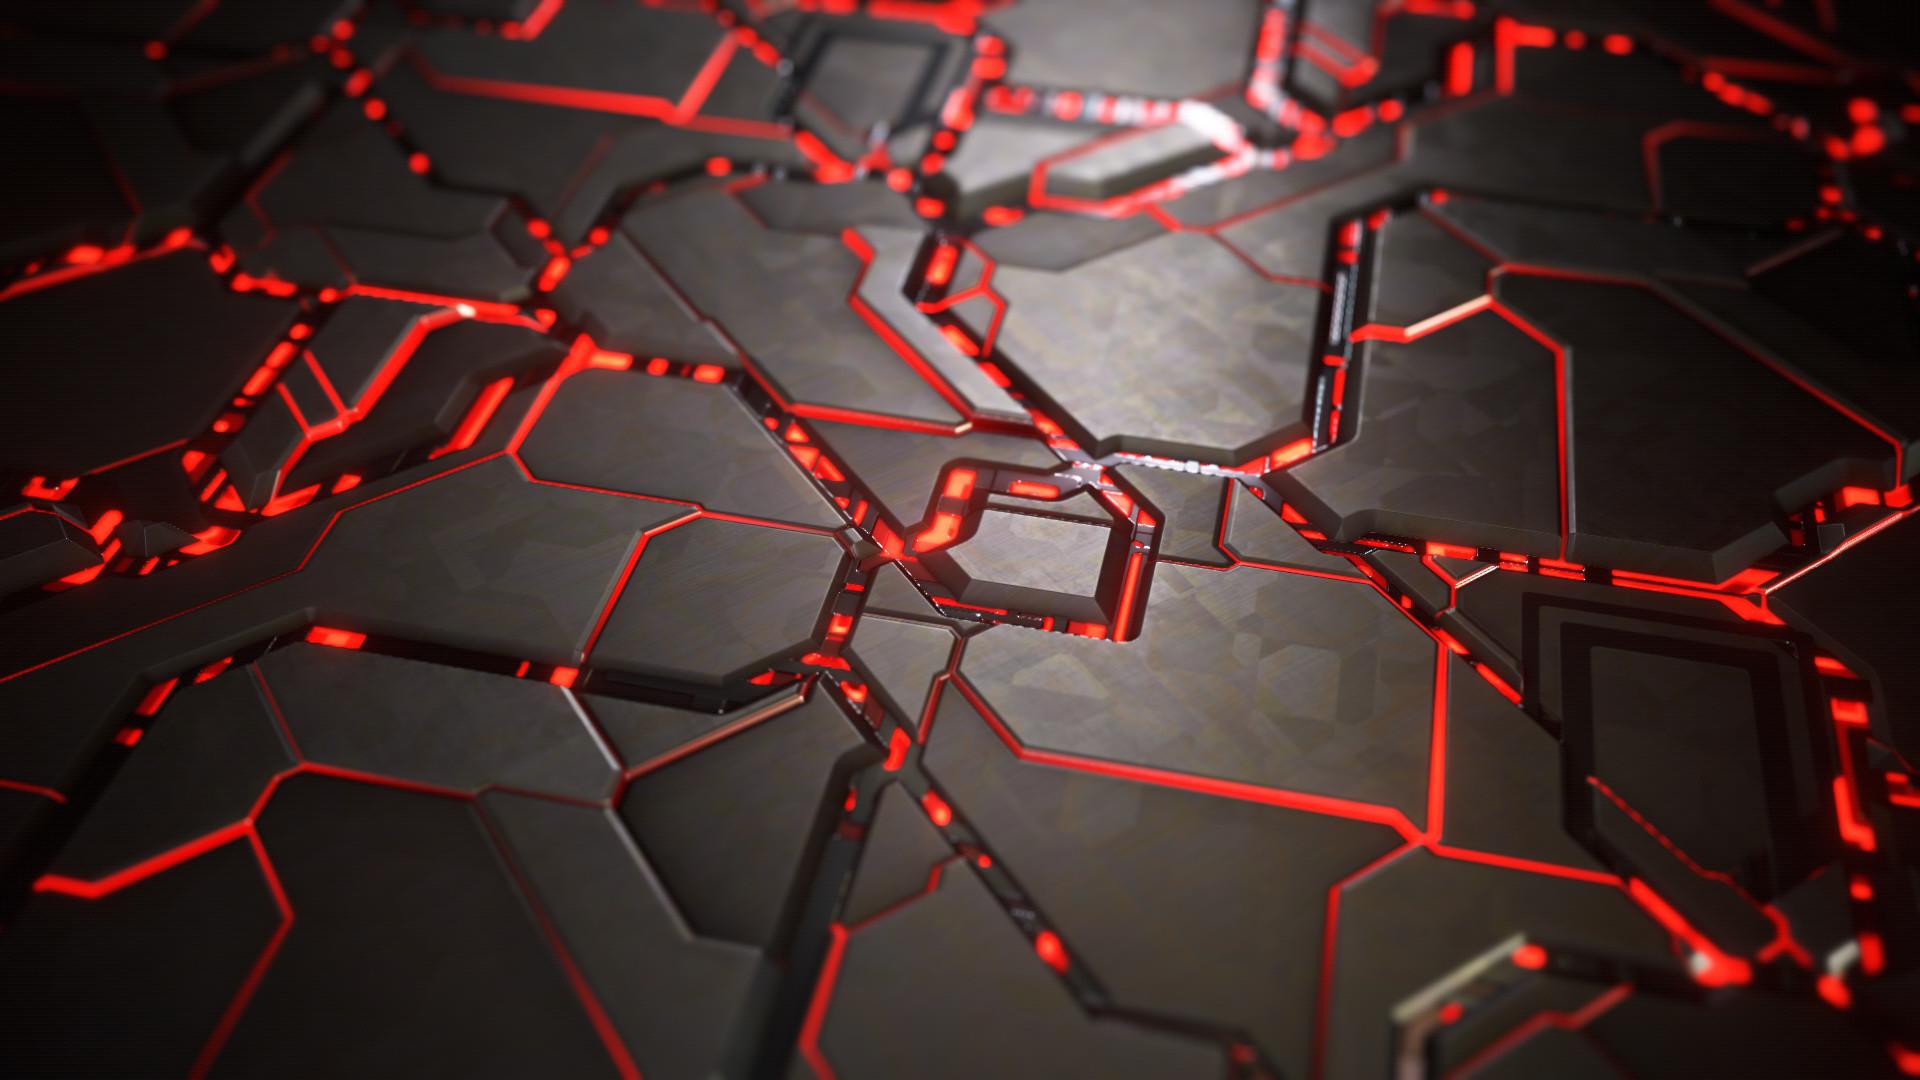 ArtStation - Procedural Sci-Fi Greeble, Will Fuller